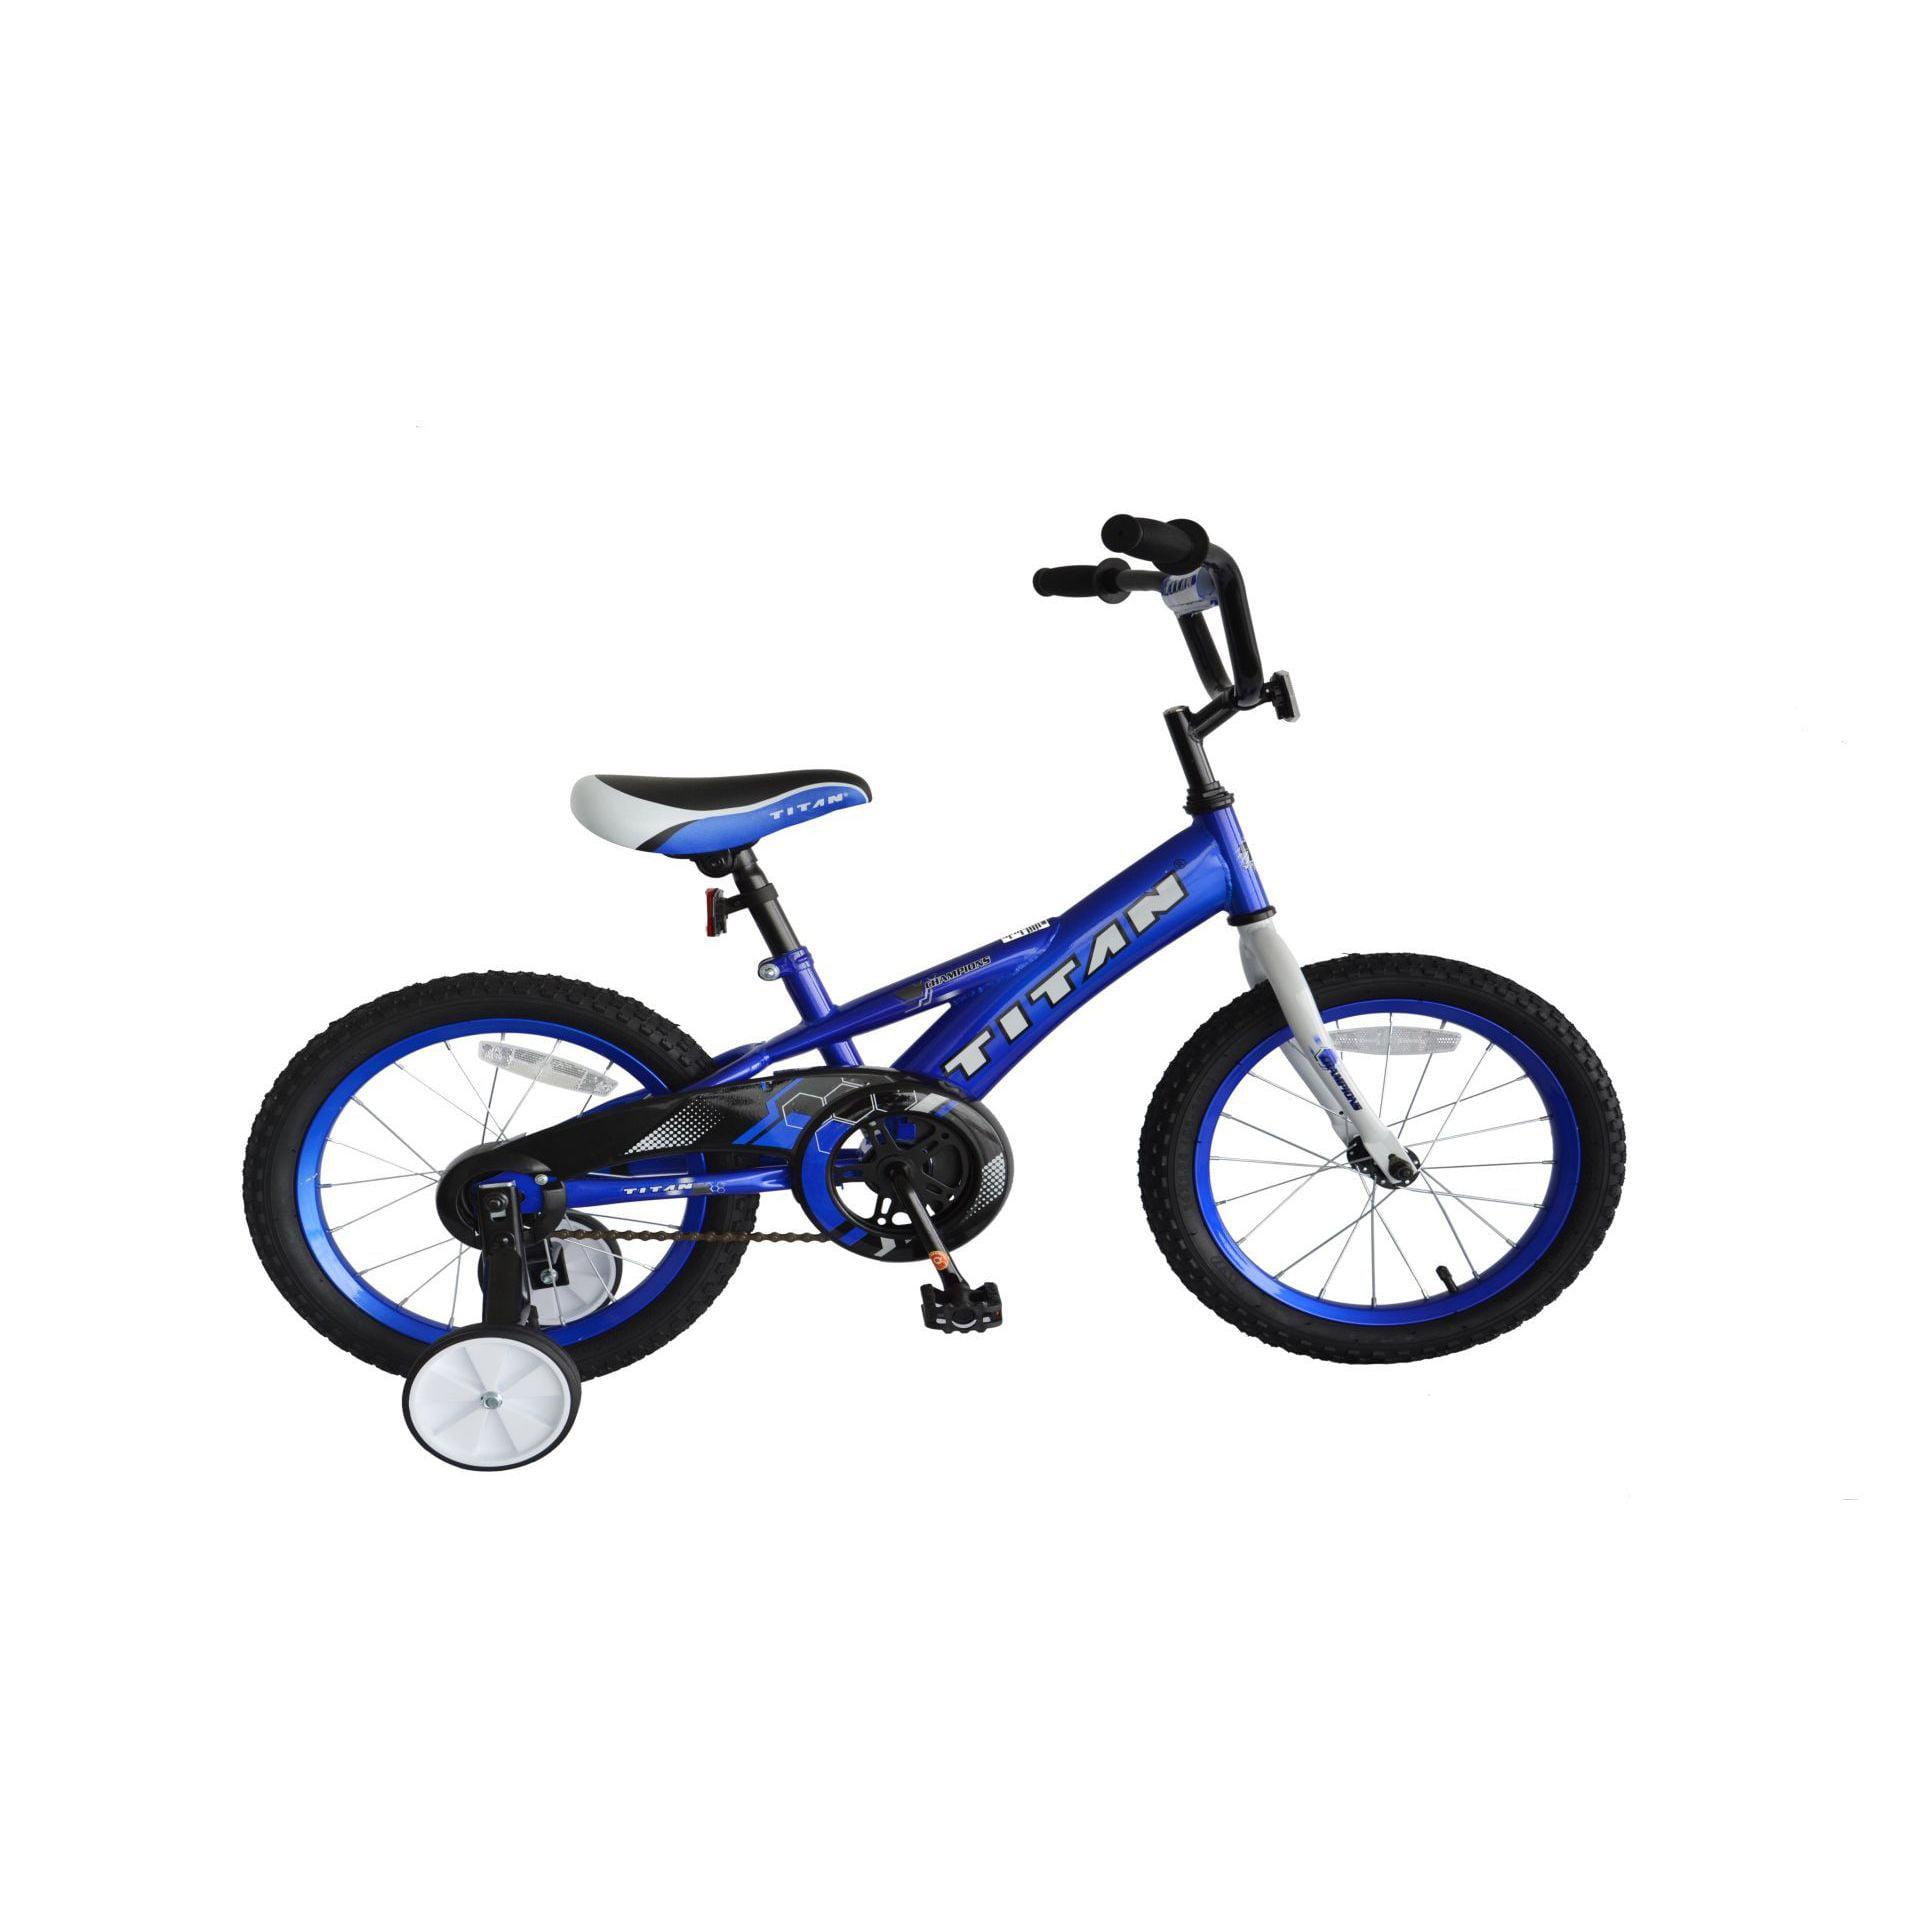 TITAN Champion Boys BMX Bike with Training Wheels, 16-Inch, Green by Titan